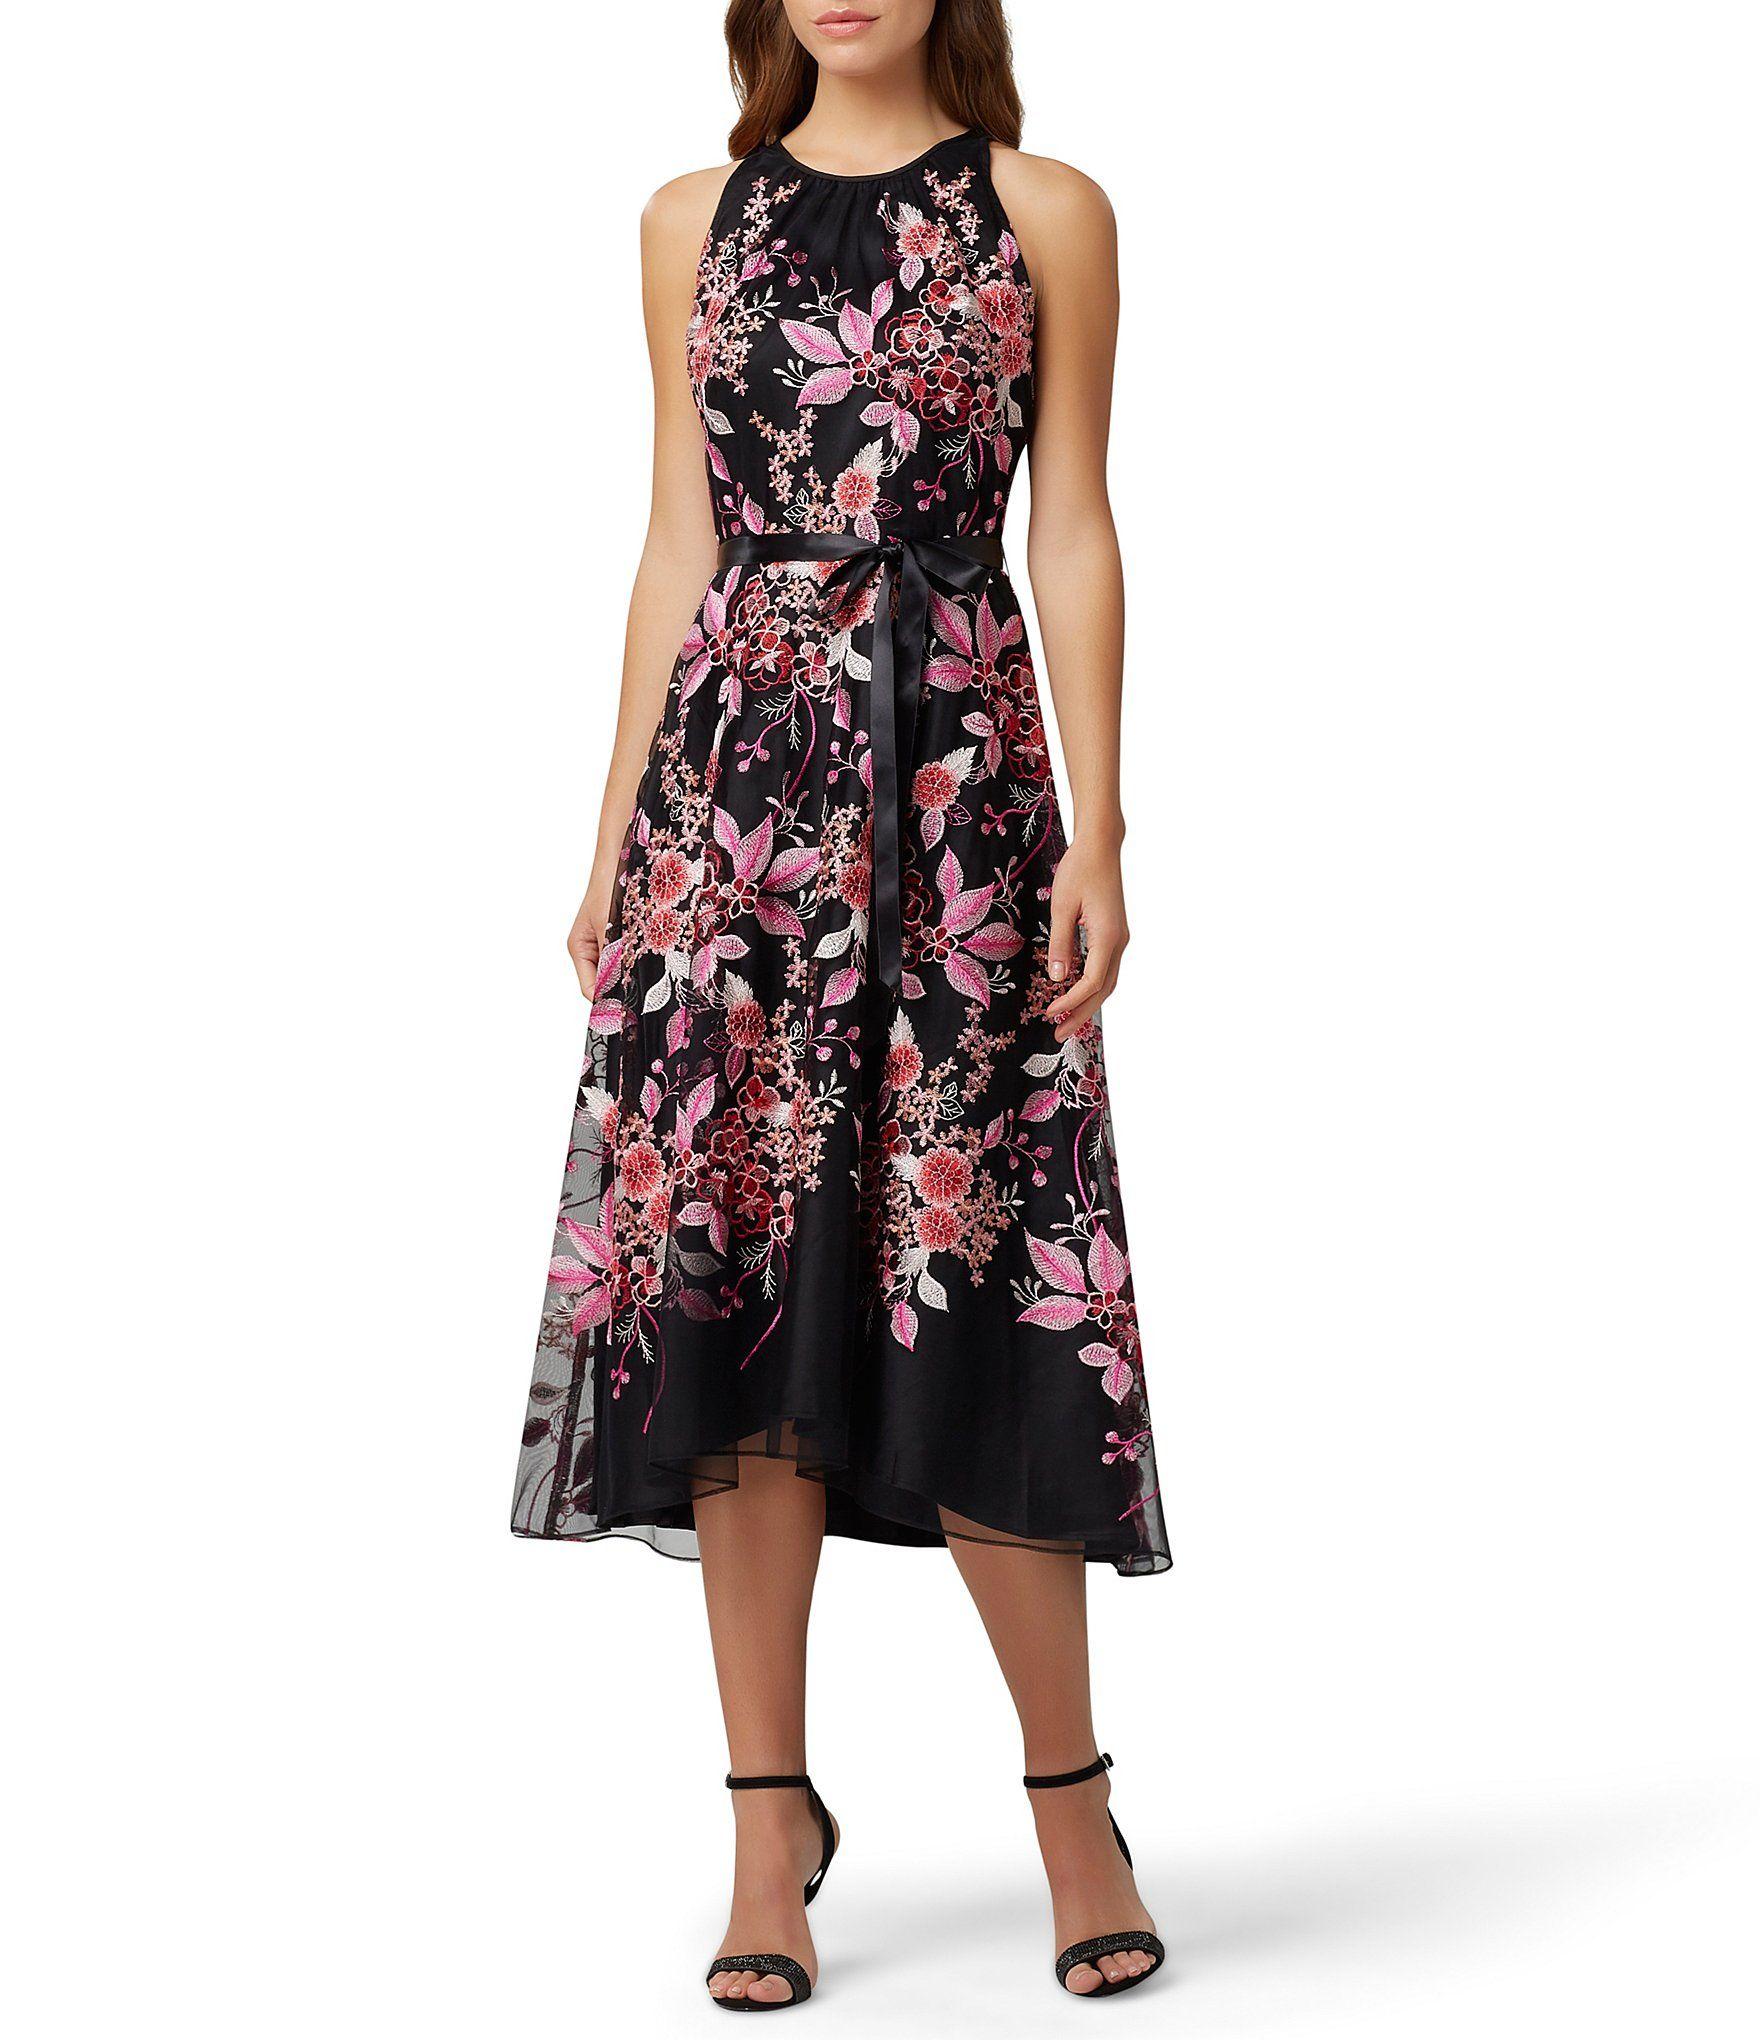 Tahari Asl Sleeveless Floral Embroidered Midi Dress In 2020 Hi Low Dresses Black Midi Dress Nordstrom Dresses